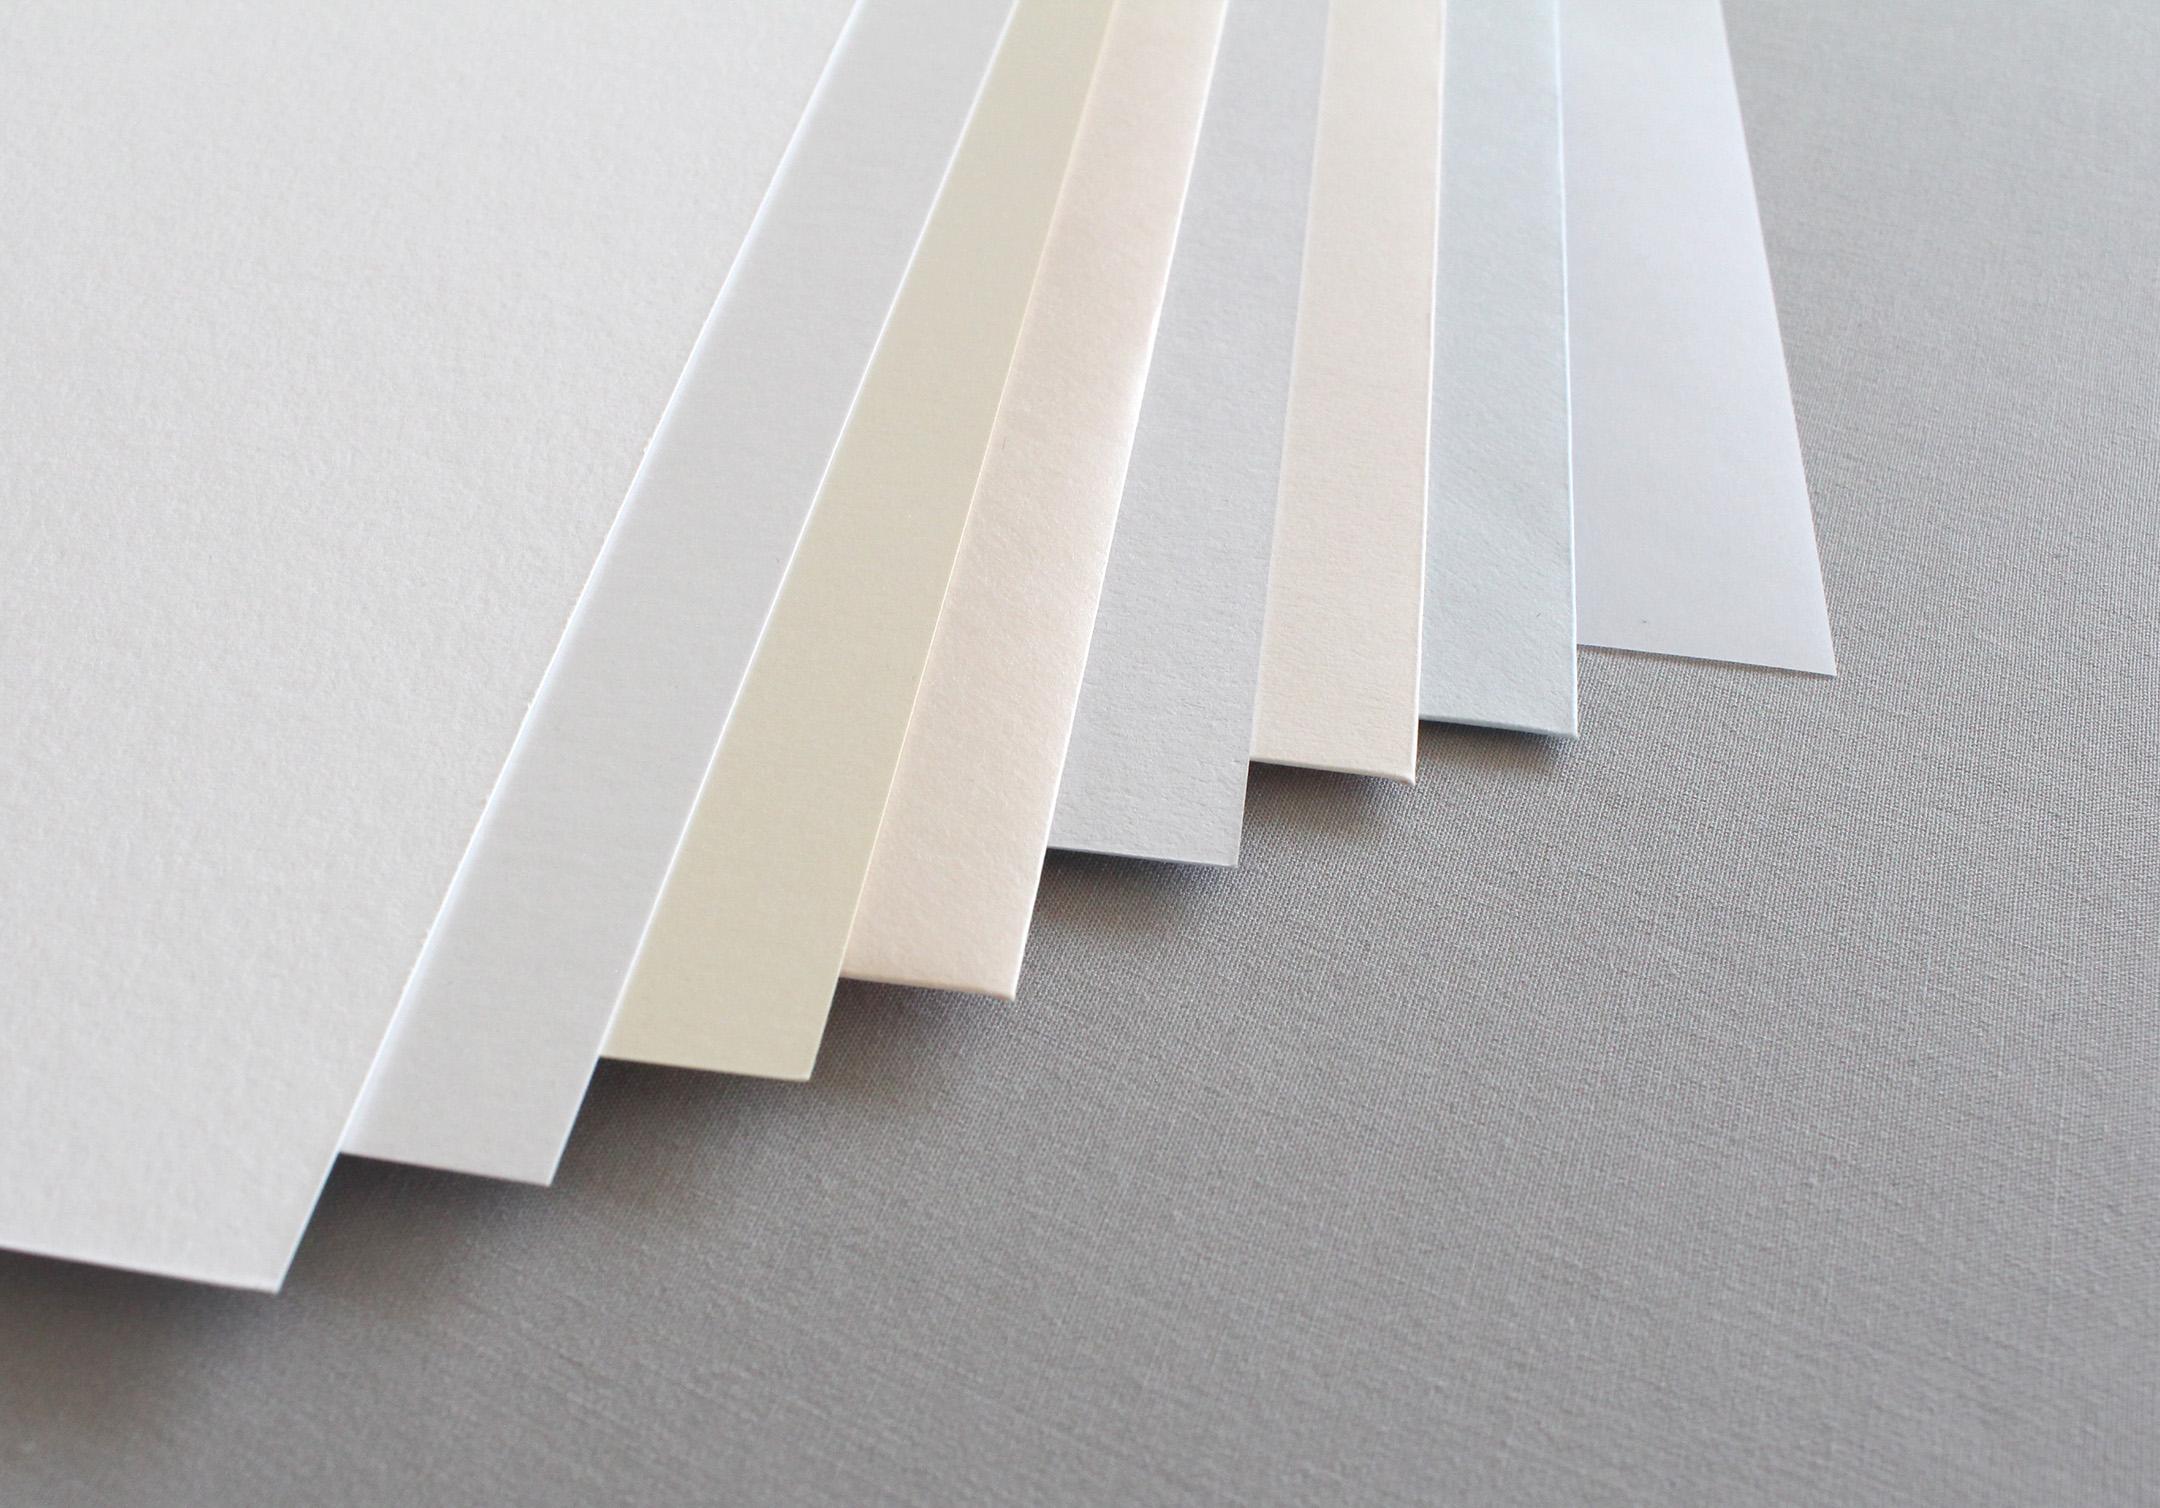 Cotton:  White -  Metallic:  Crystal, Ivory, Coral -  Matte:  Pale Grey, Soft Coral, Pale Blue -  Vellum